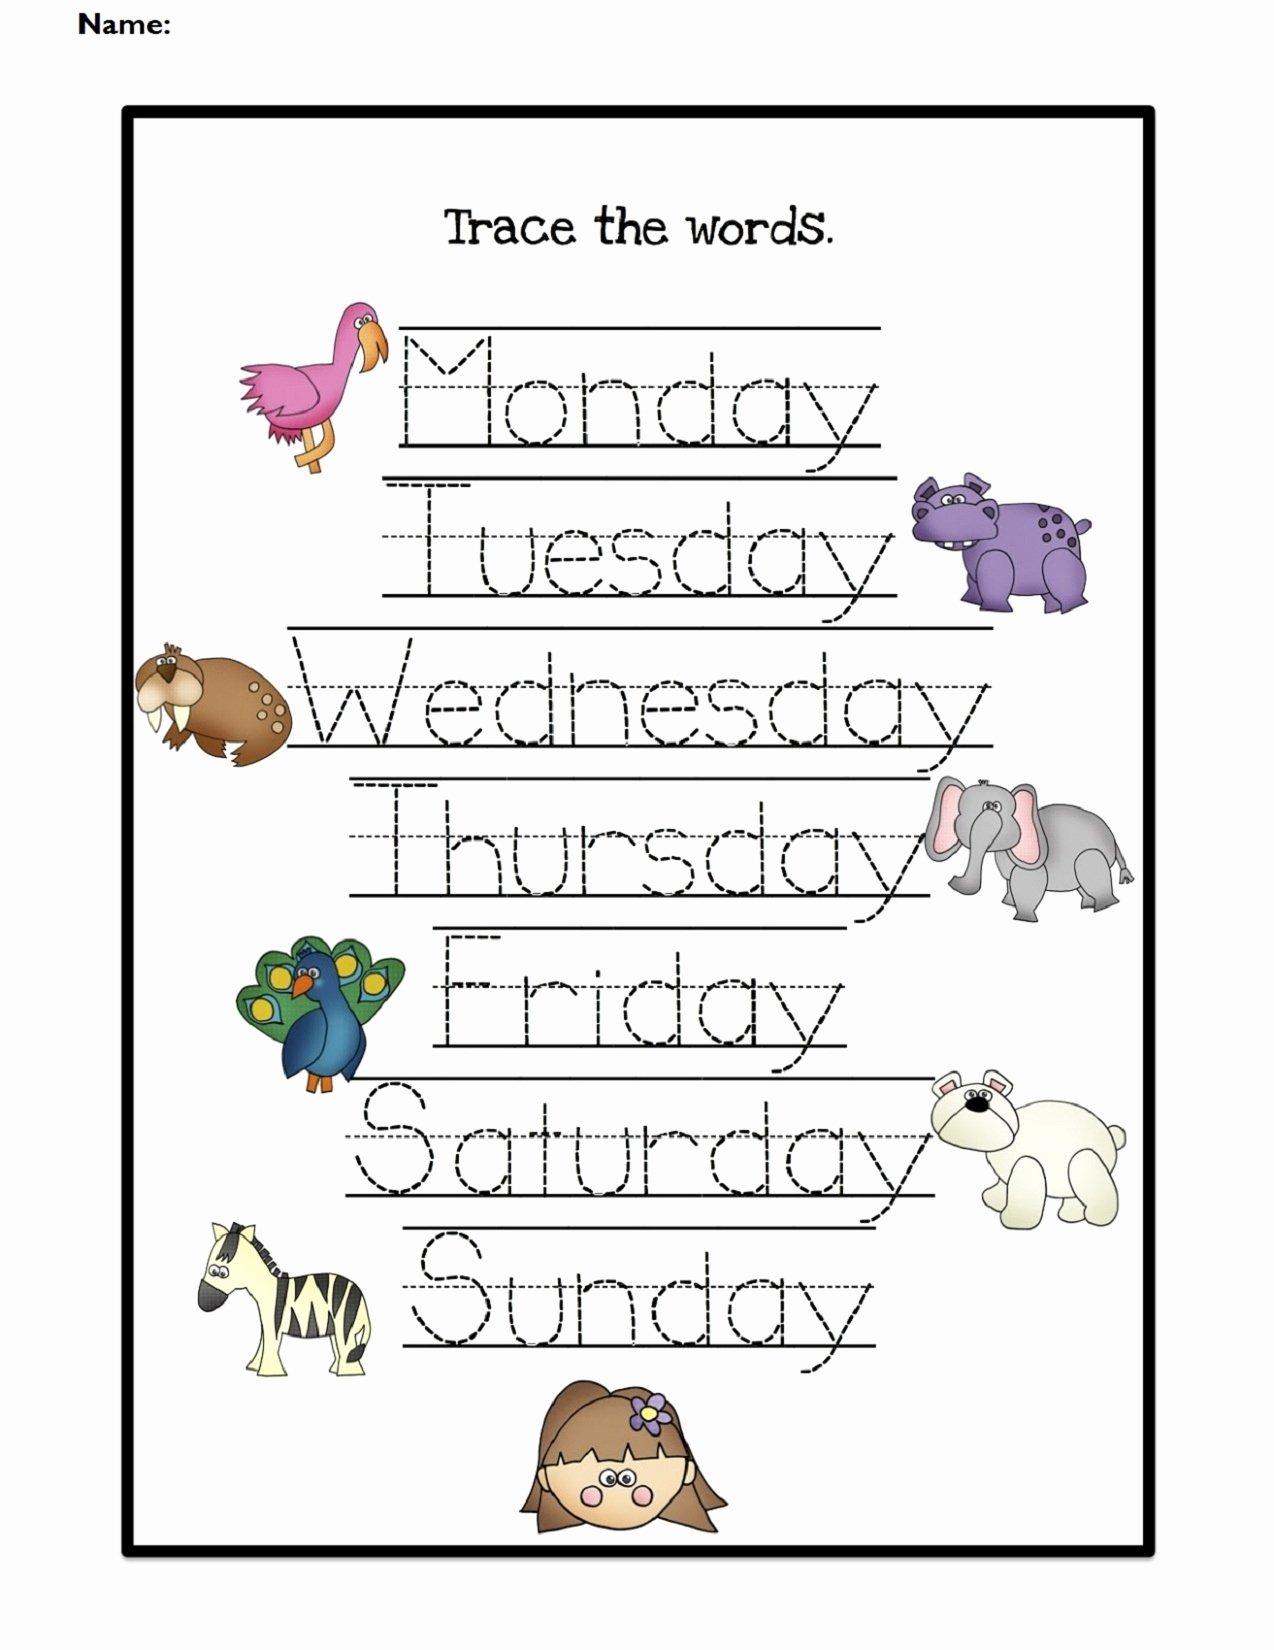 Days Of the Week Worksheets for Preschoolers New Kindergarten Days the Week Matching Worksheet